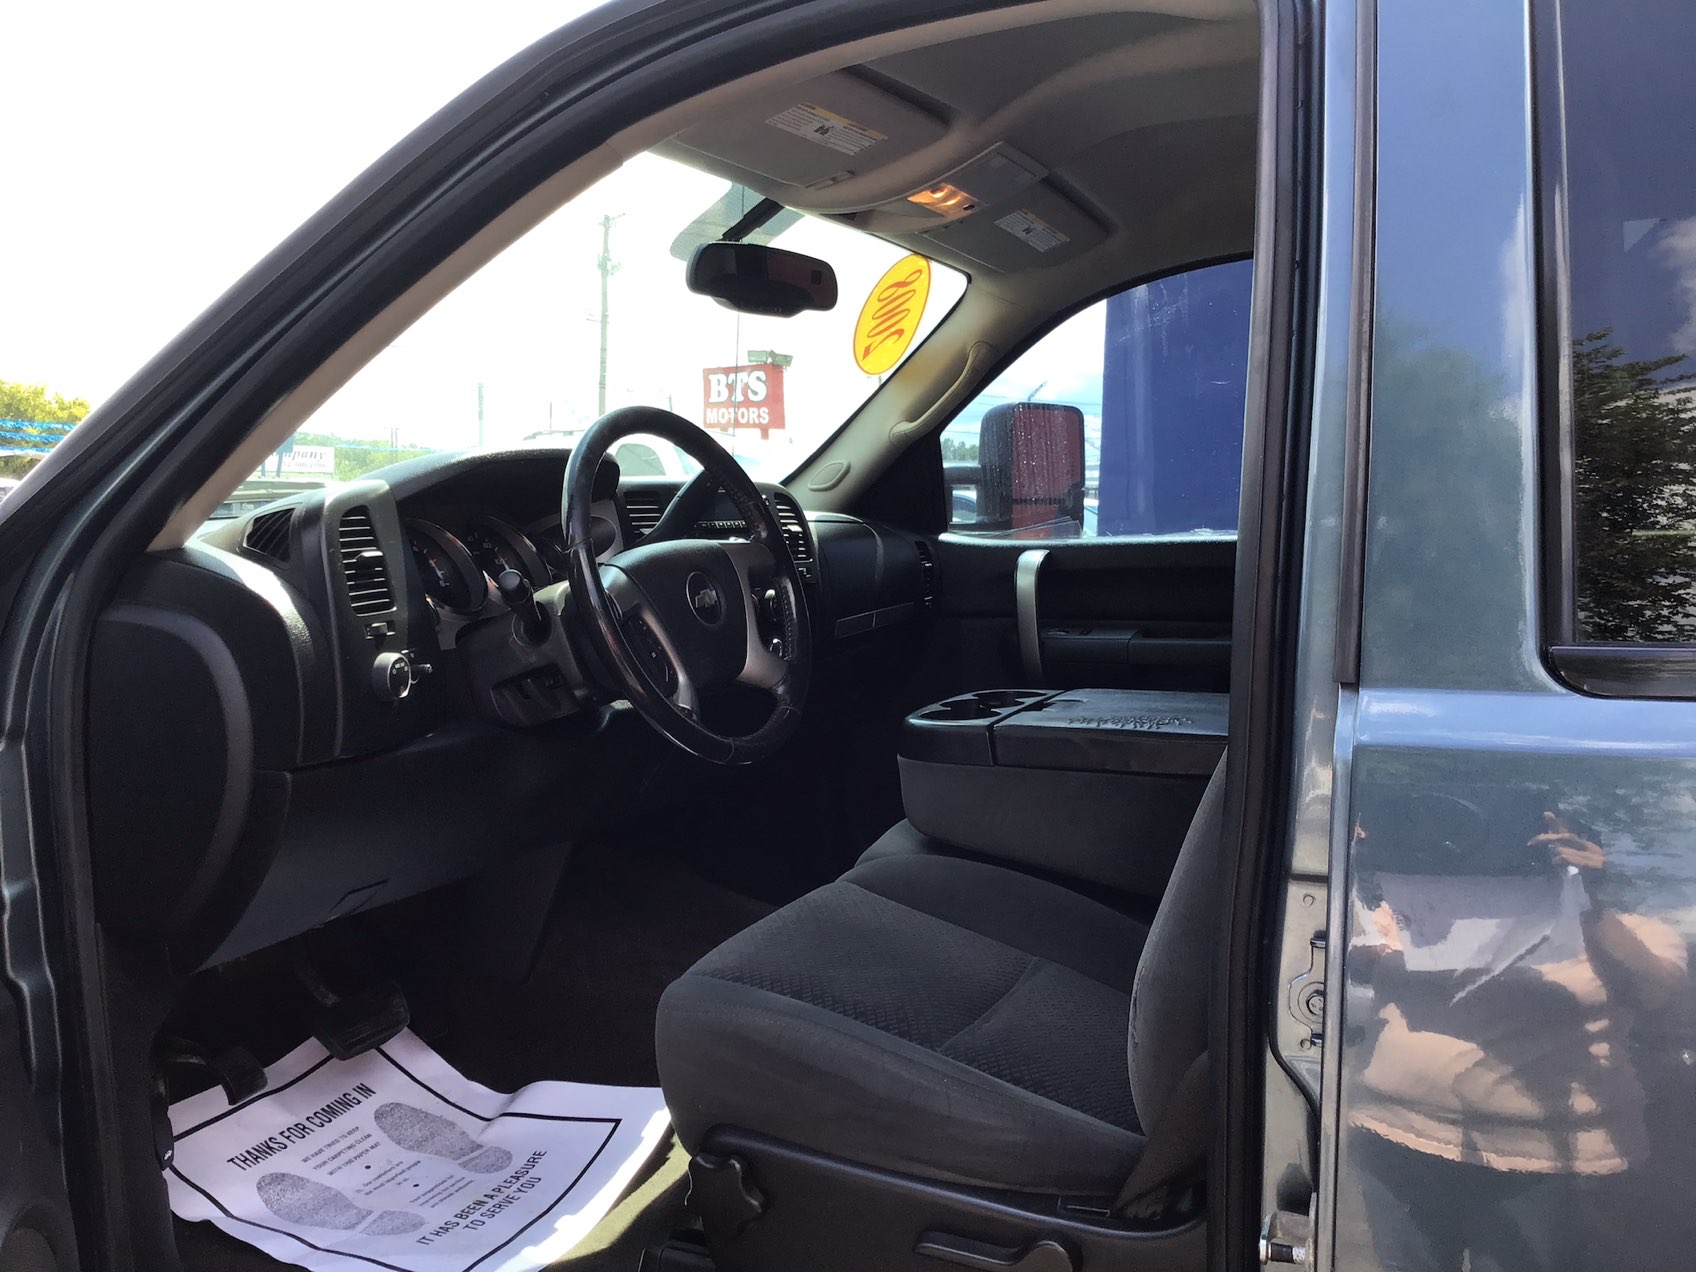 used vehicle - Truck CHEVROLET SILVERADO 1500 2008